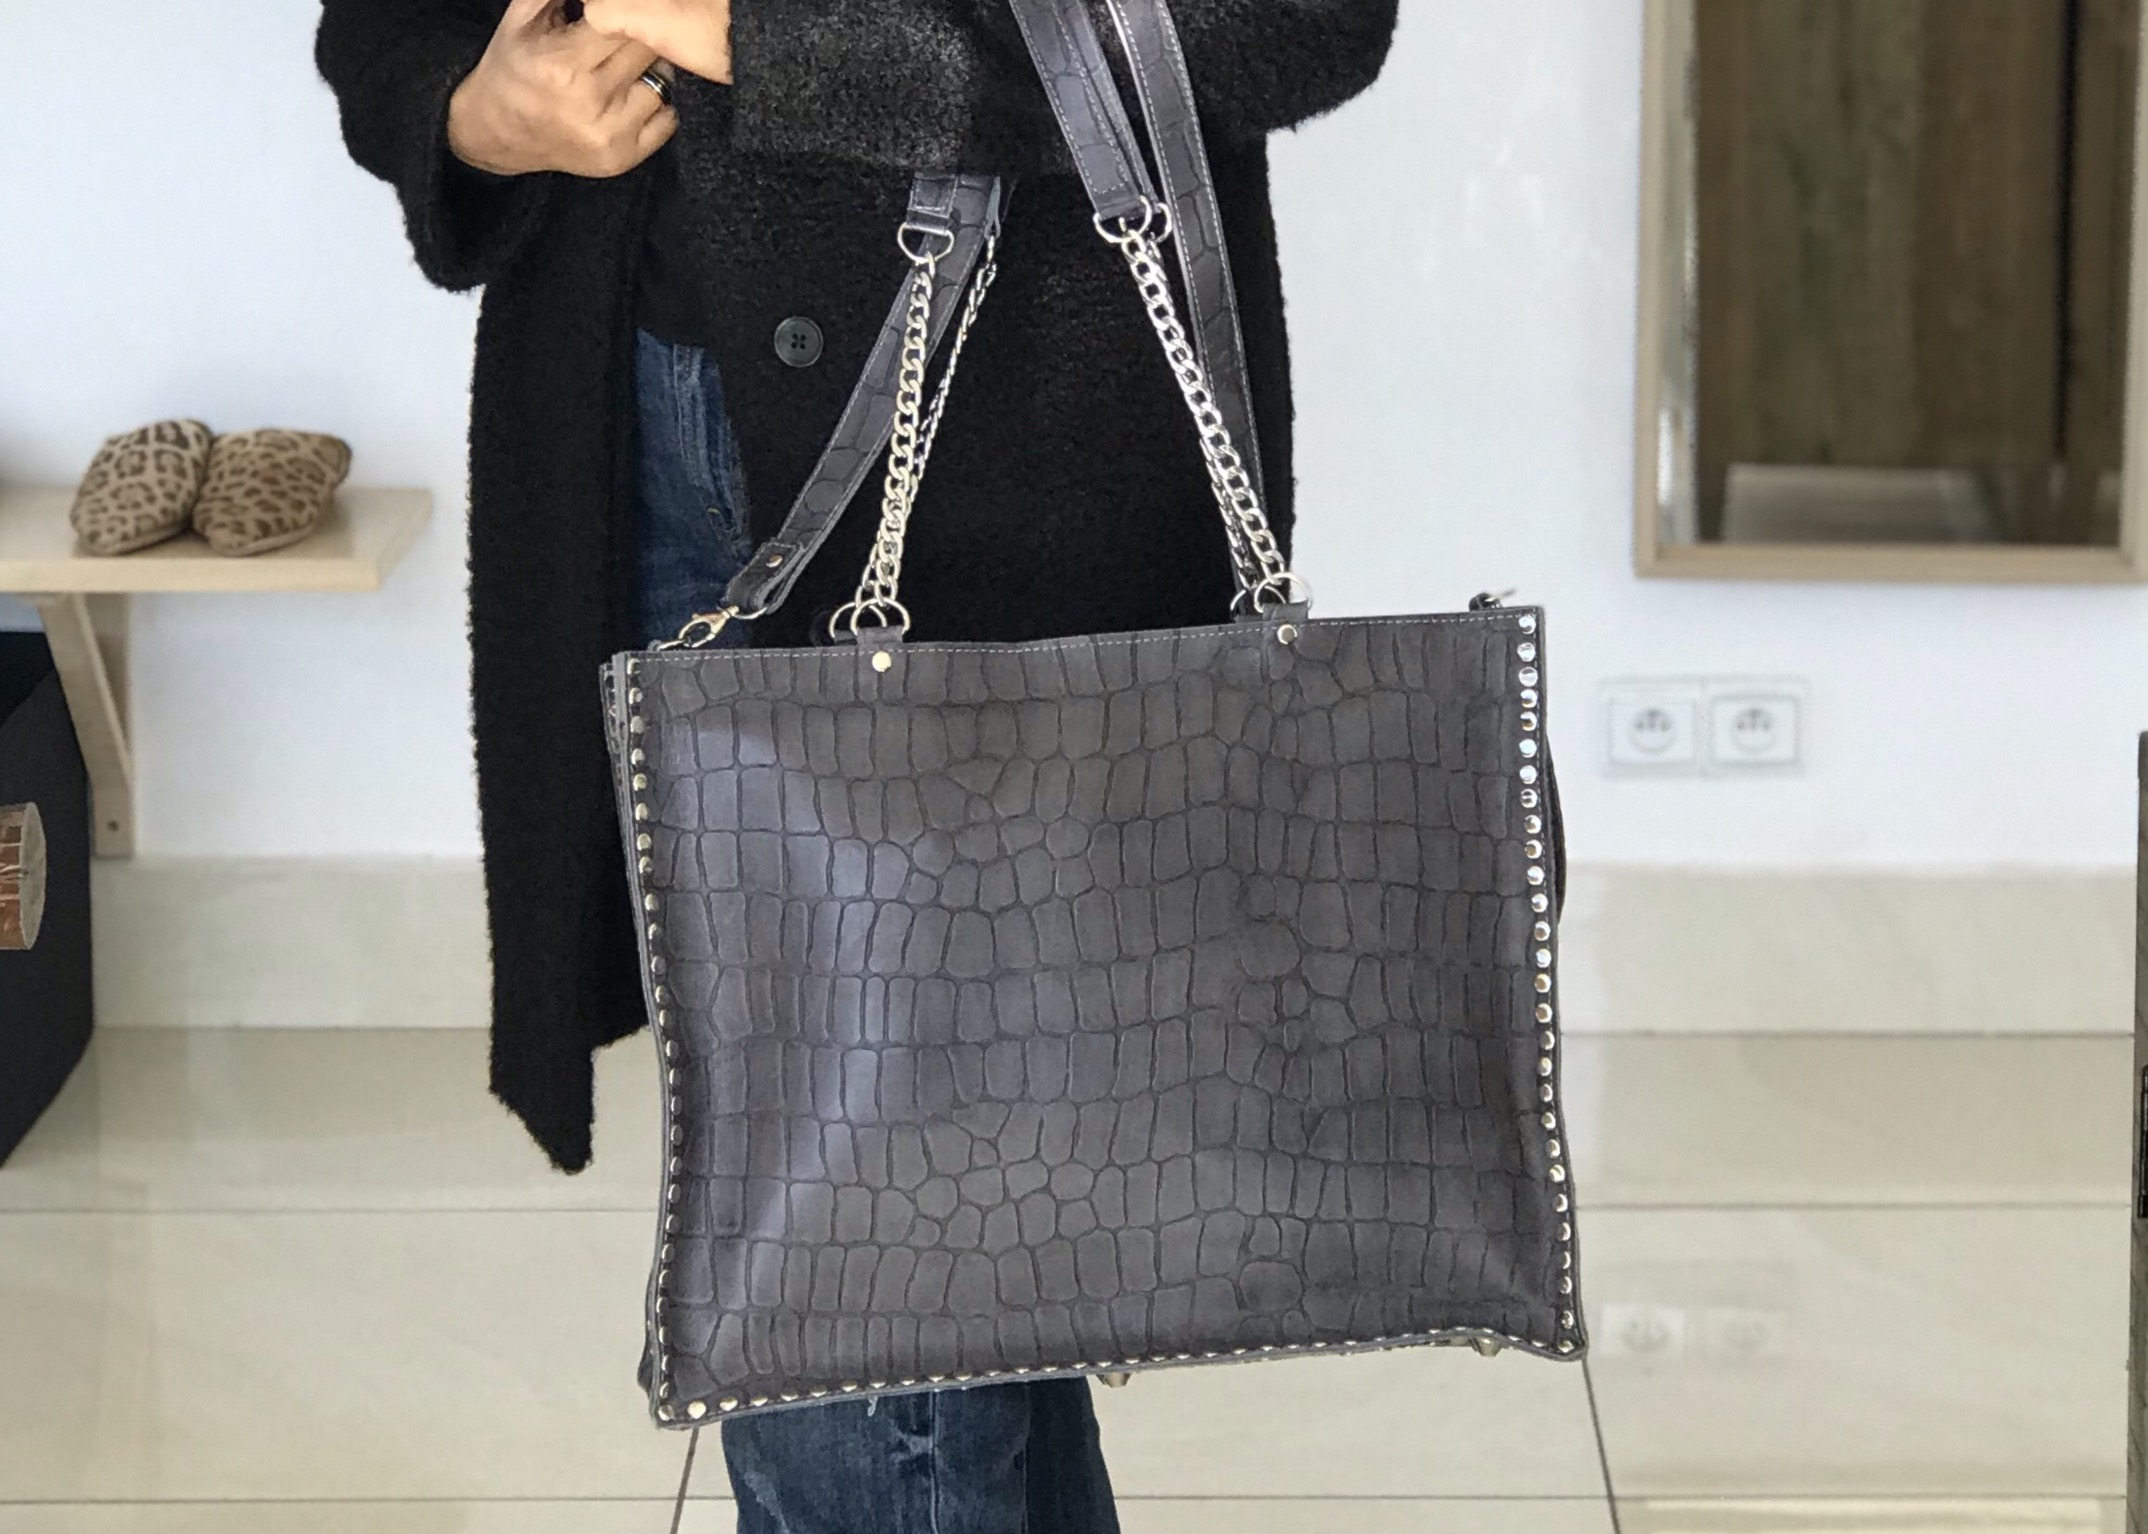 Big bag cabas leather croco grey studded